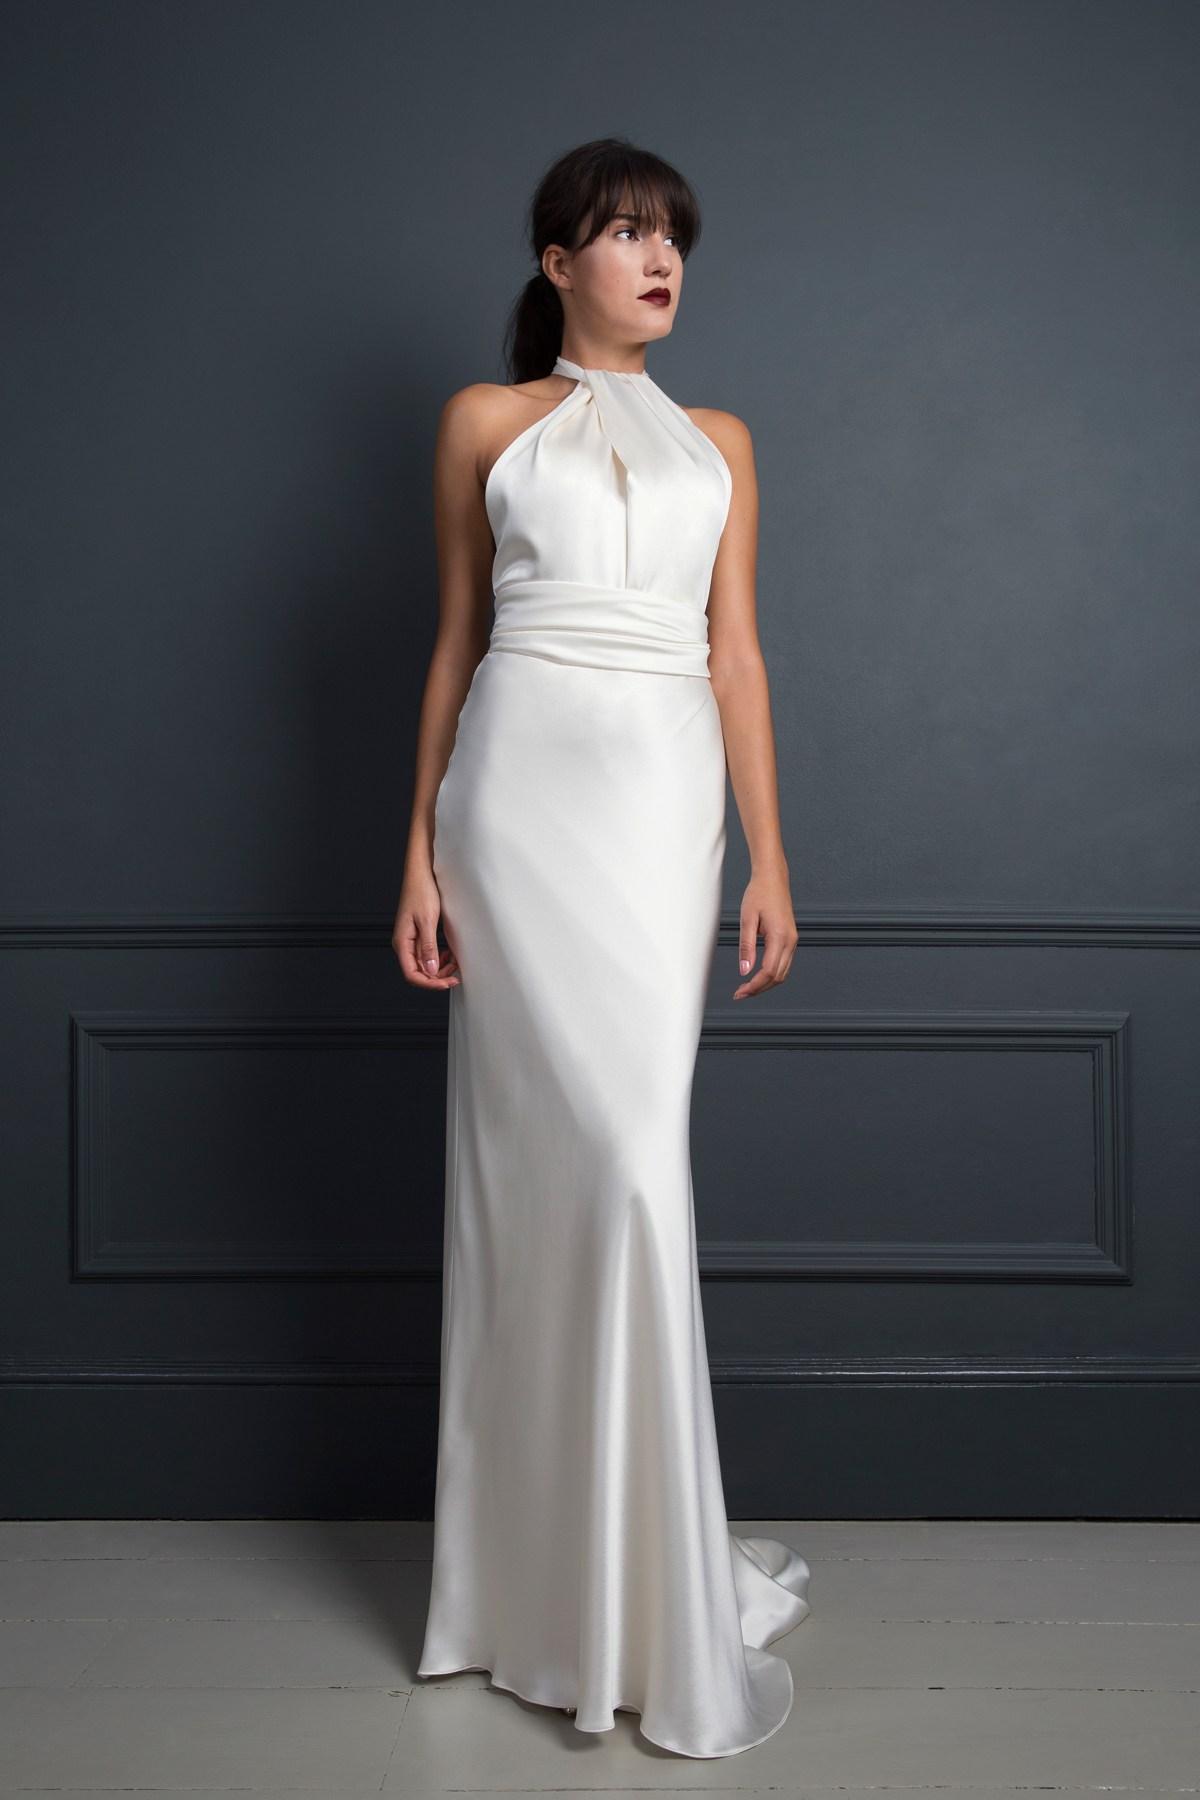 Cheryl Silk Dress by Halfpenny London